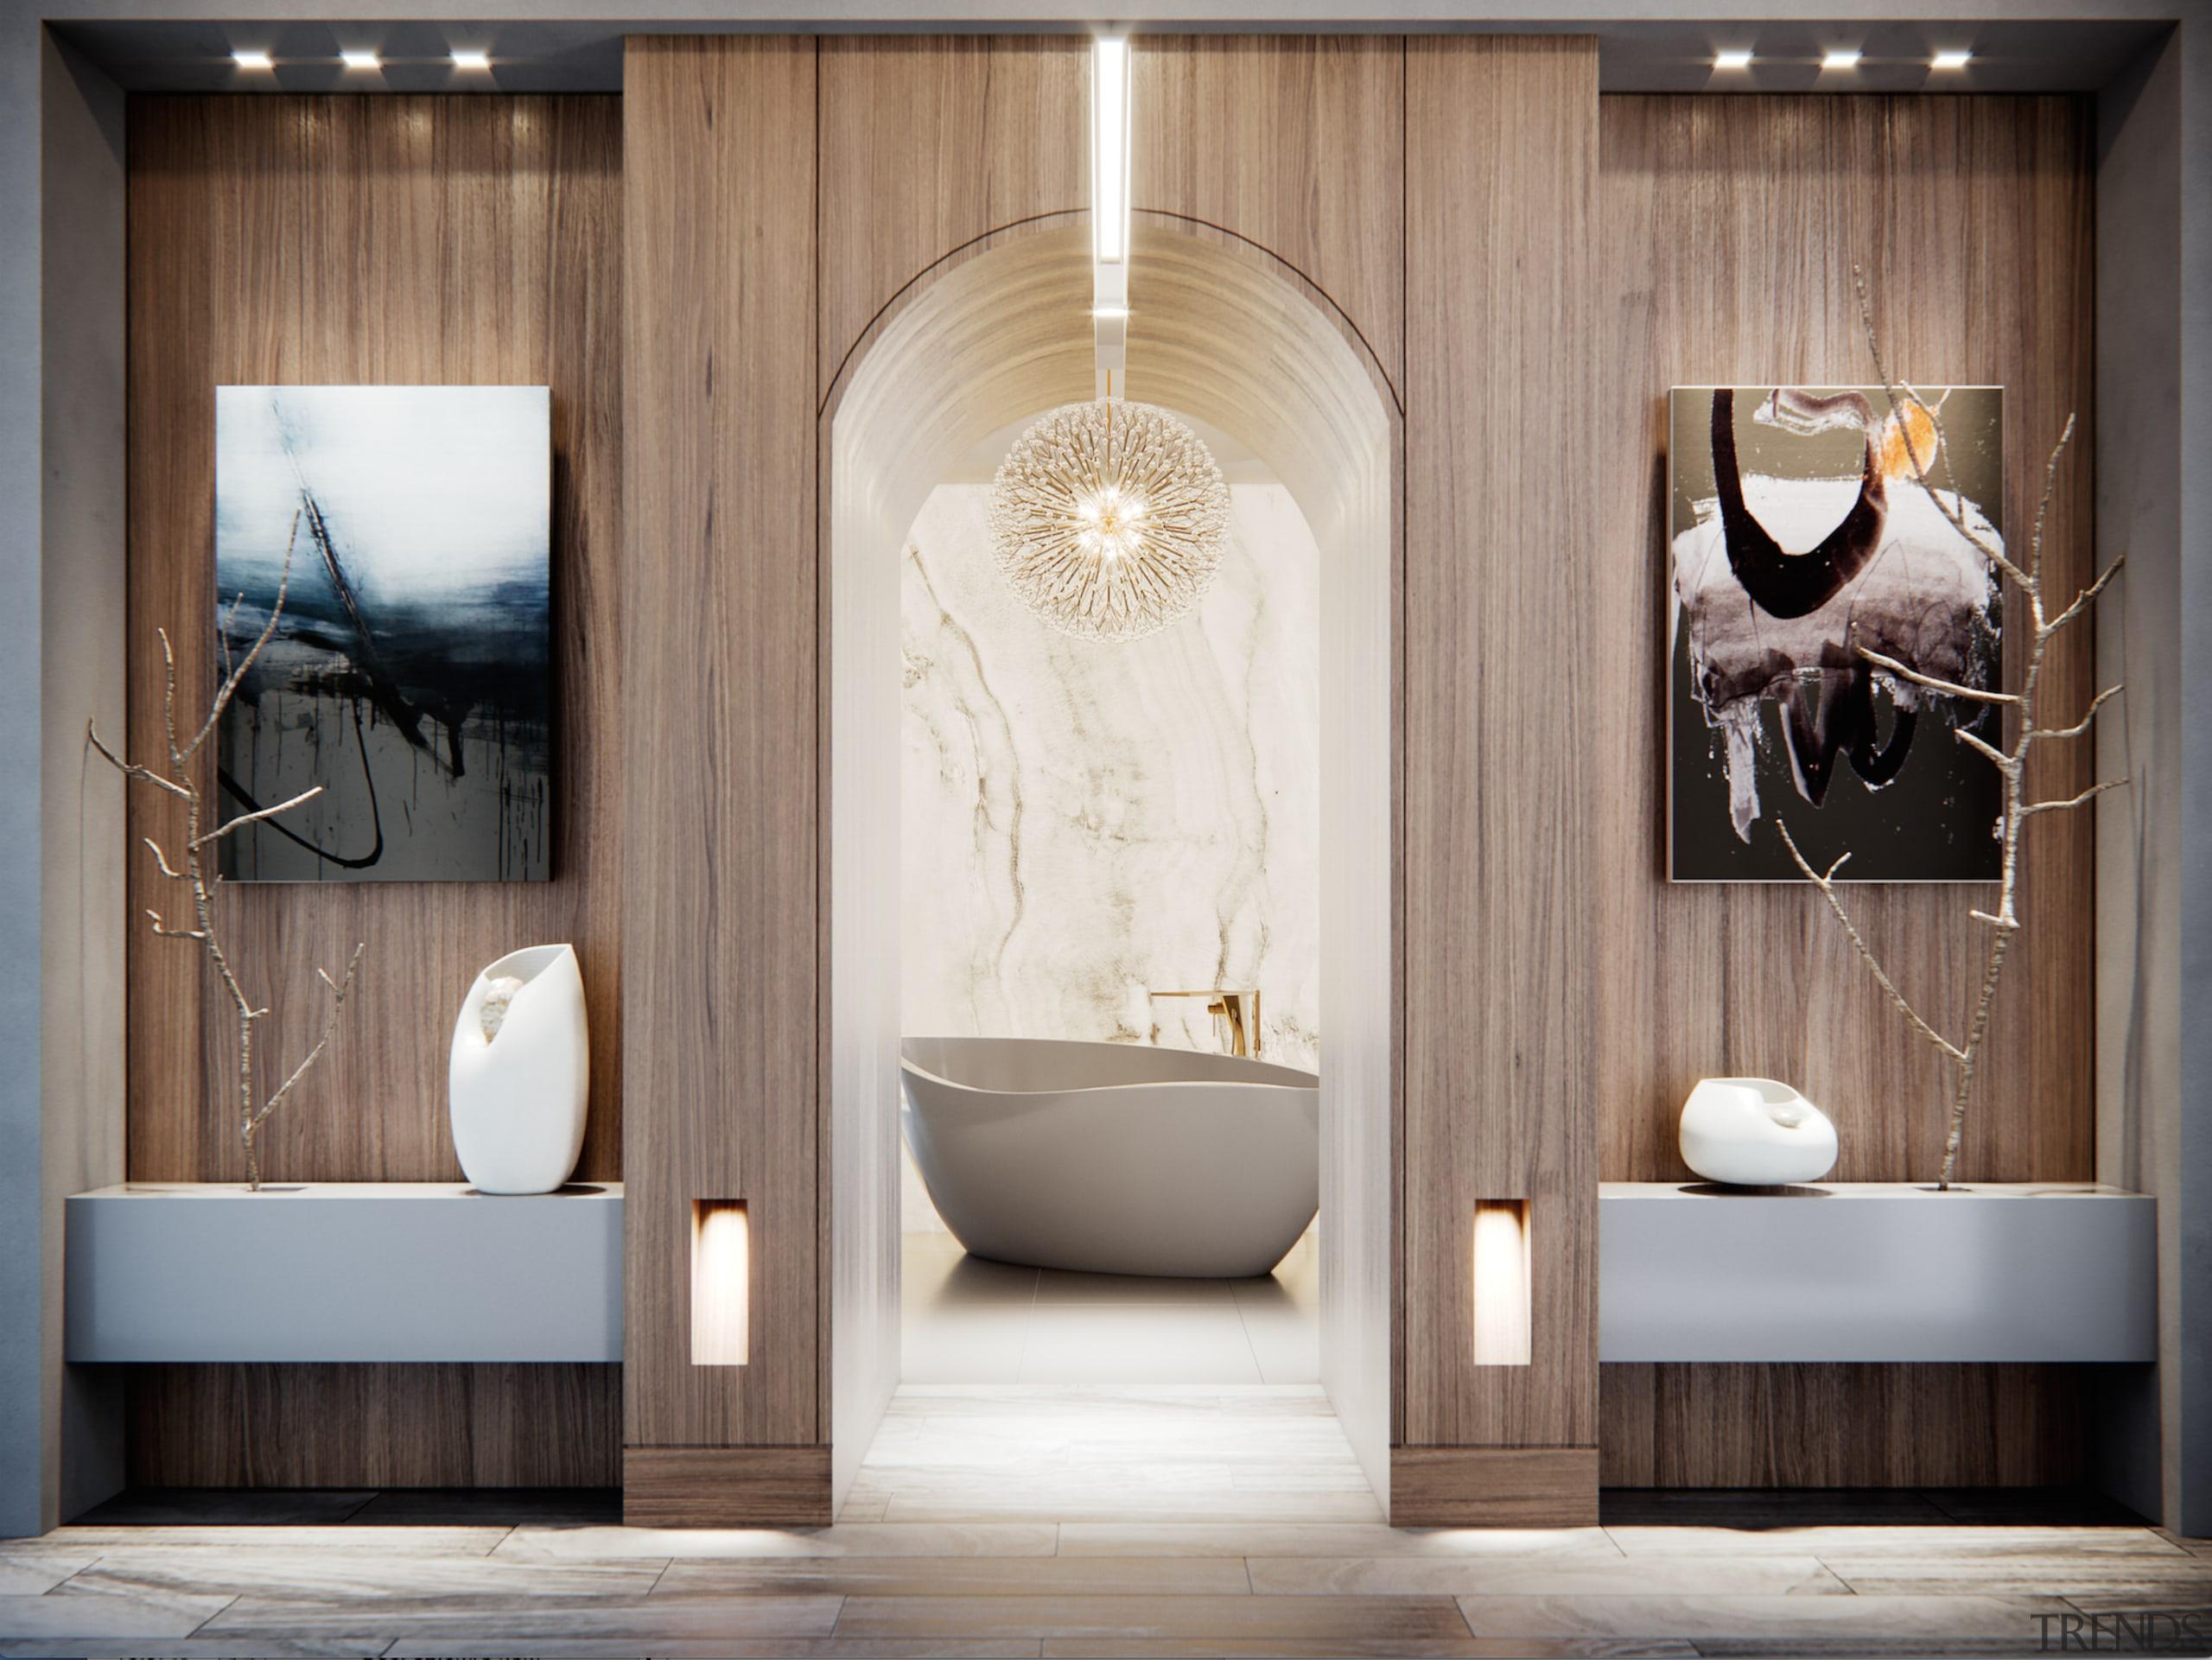 Read the full story architecture, bathroom, building, ceiling, door, floor, flooring, furniture, interior design, plumbing fixture, room, tile, gray